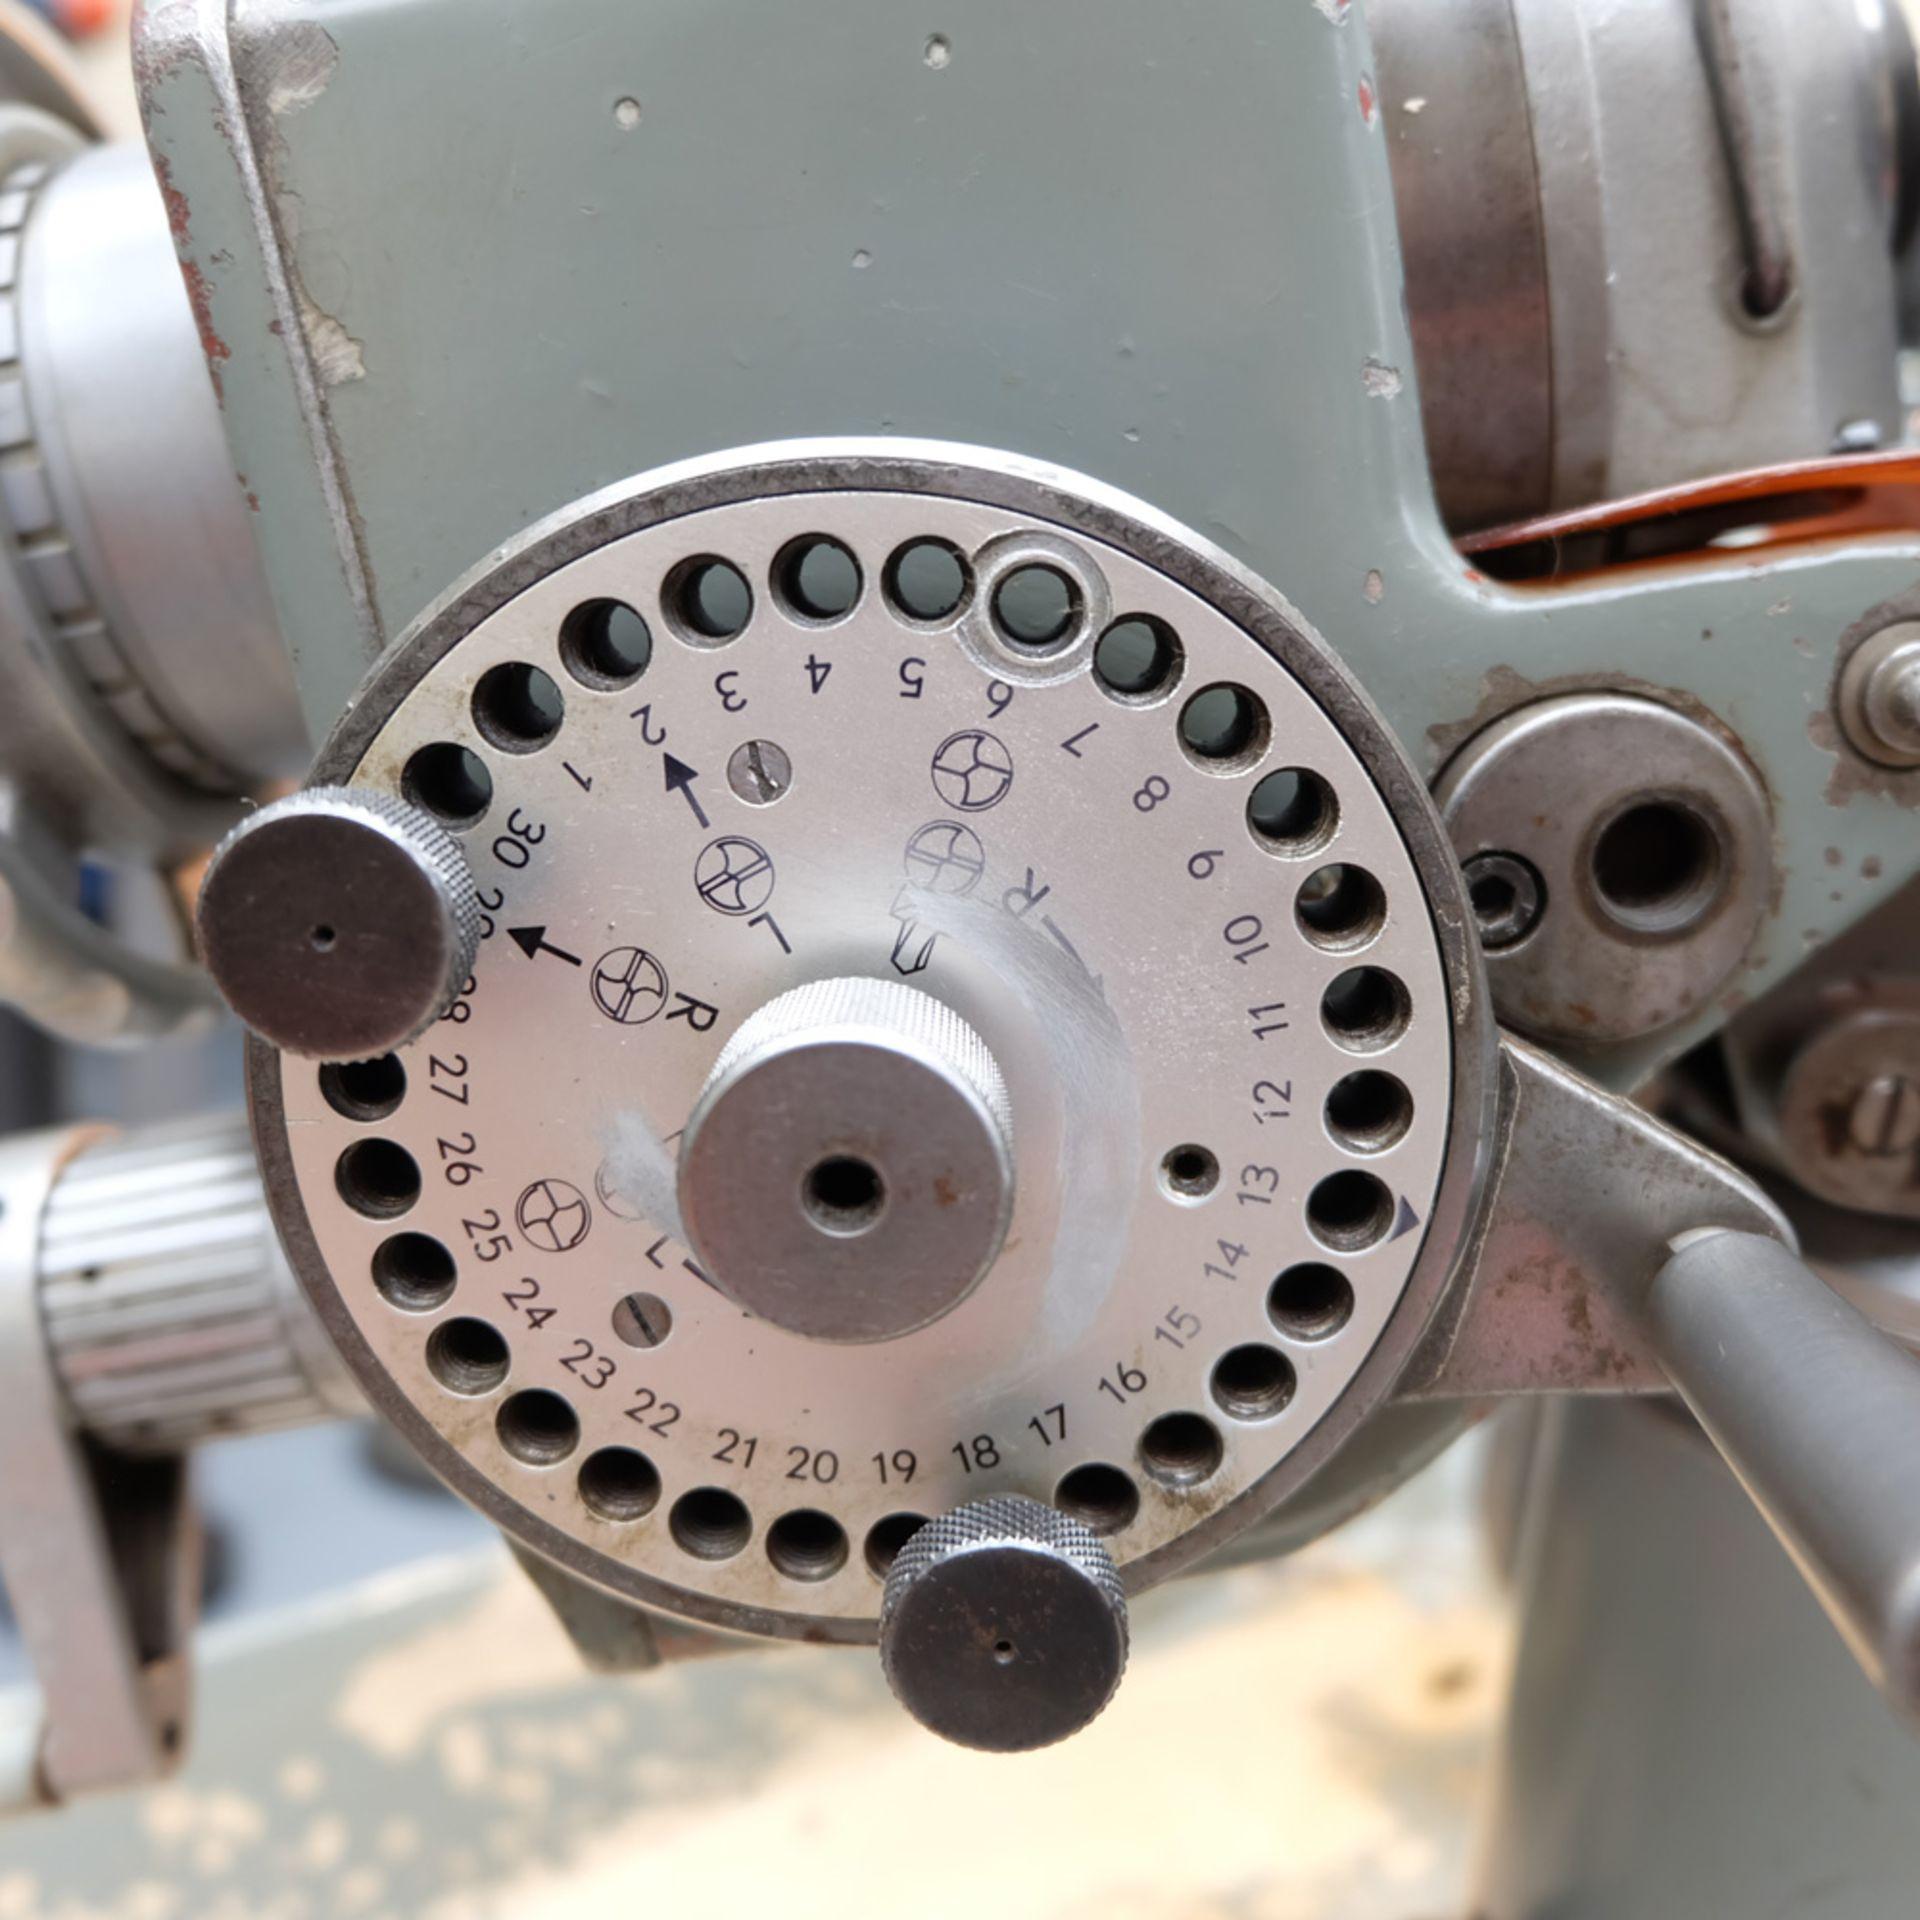 Christen Type 2-32 Twist Drill Grinding Machine. - Image 5 of 14